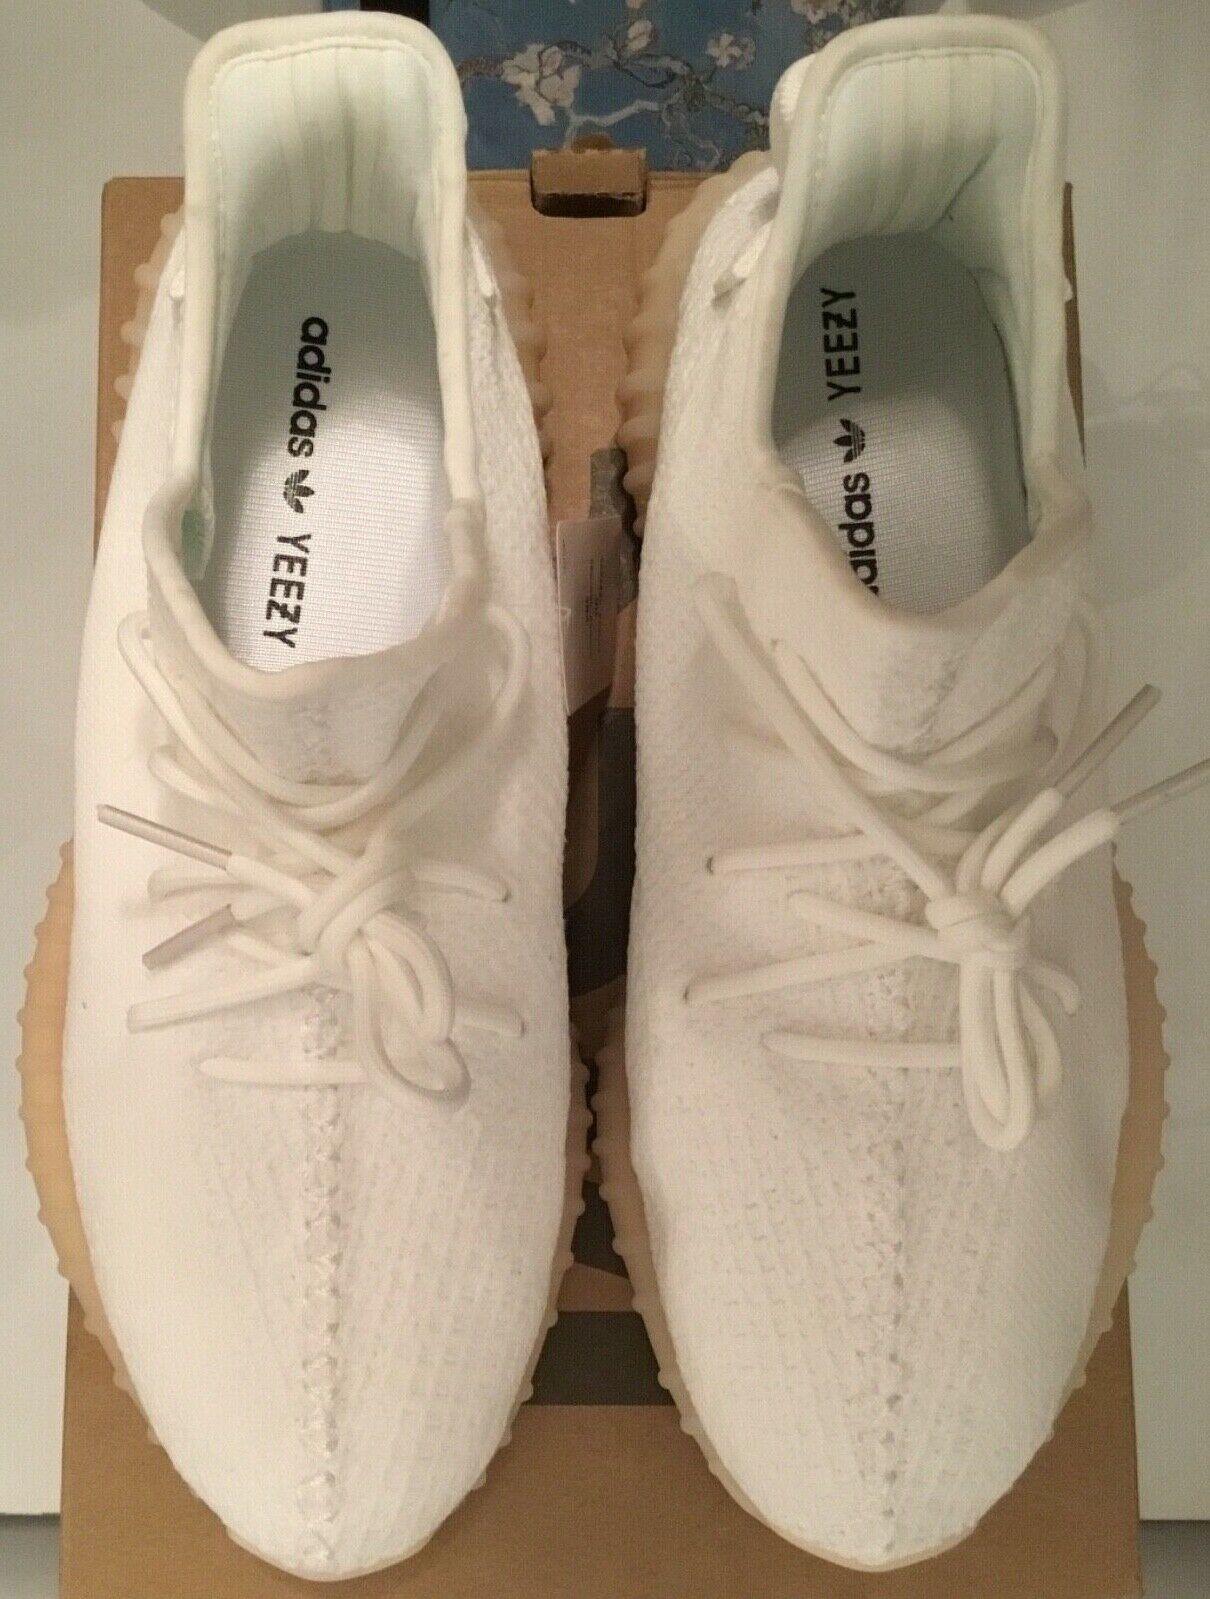 ORIGINALE adidas Yeezy Boost 350 V2 Crema  2US 11 Authentic tutto bianco